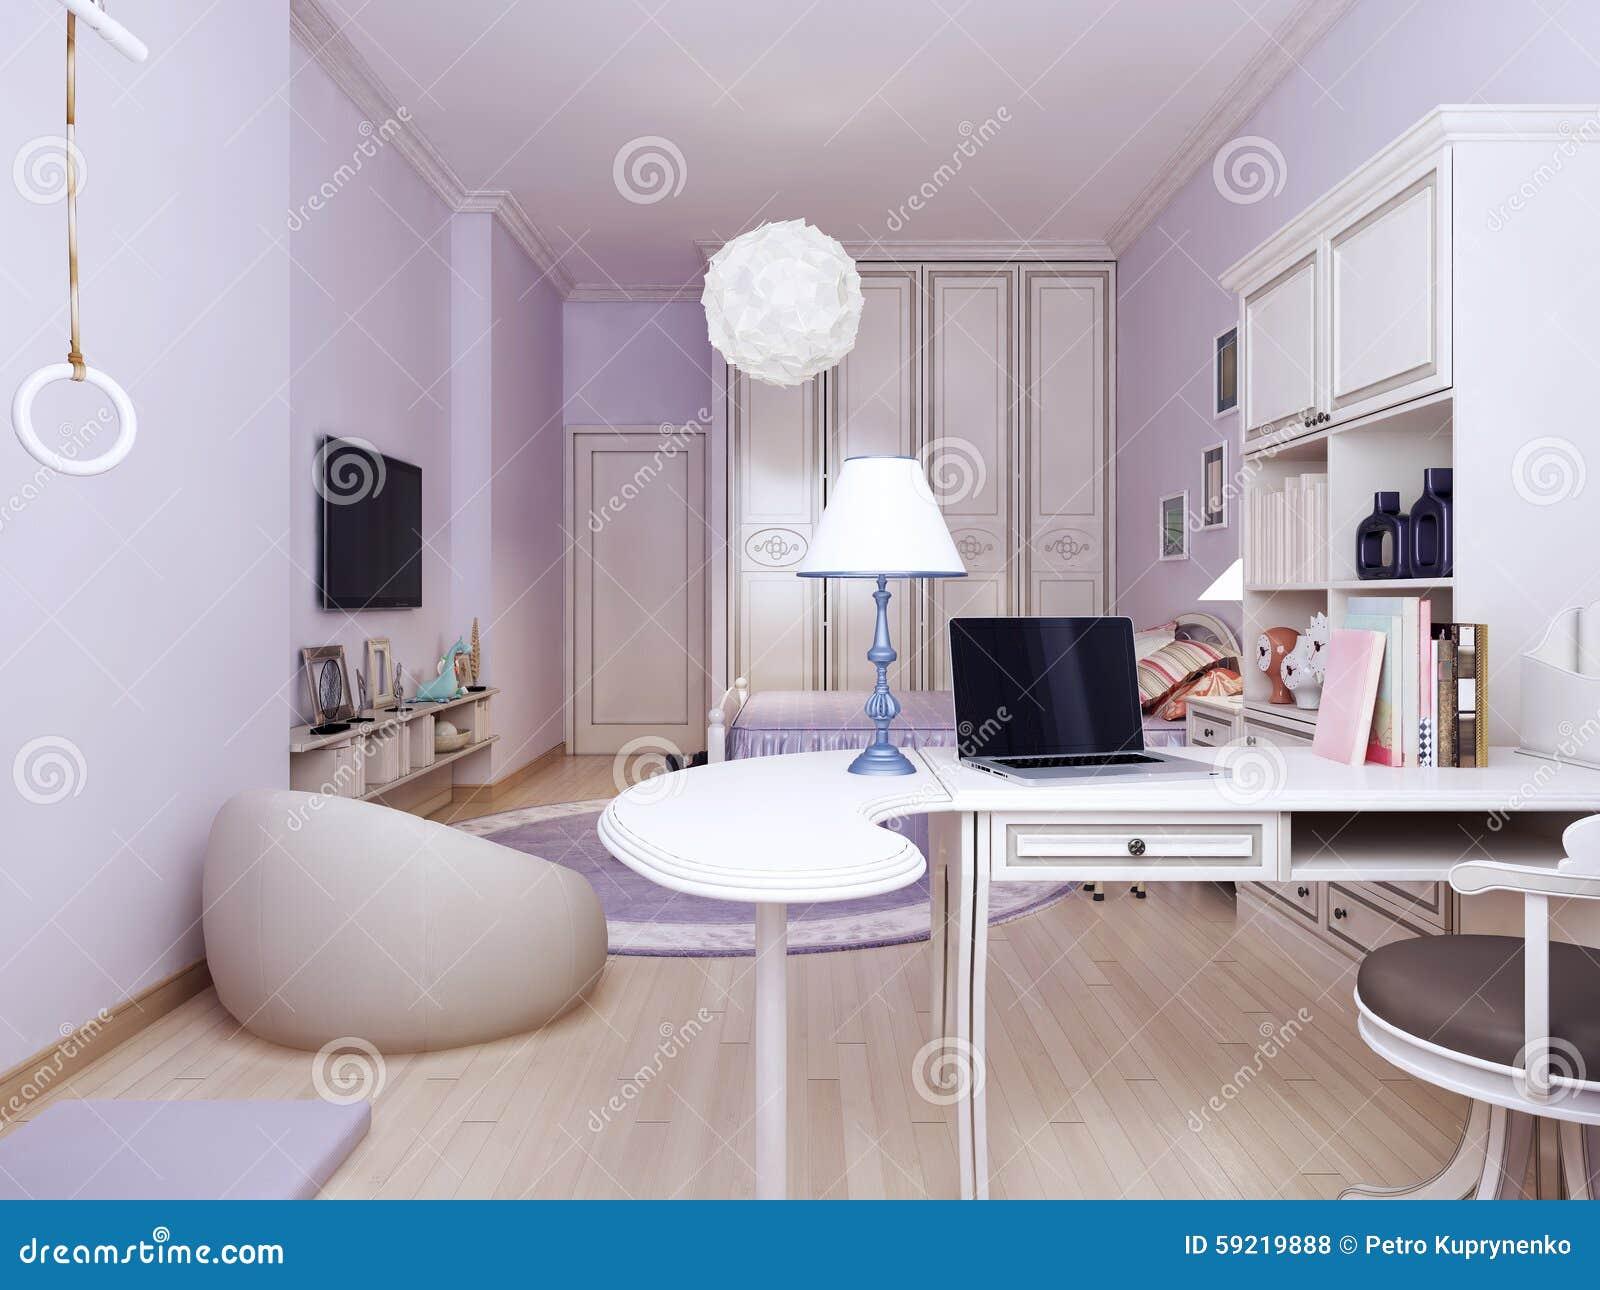 Ide de chambre chambre junior garcon ikea modele de deco for Exemple deco chambre bebe